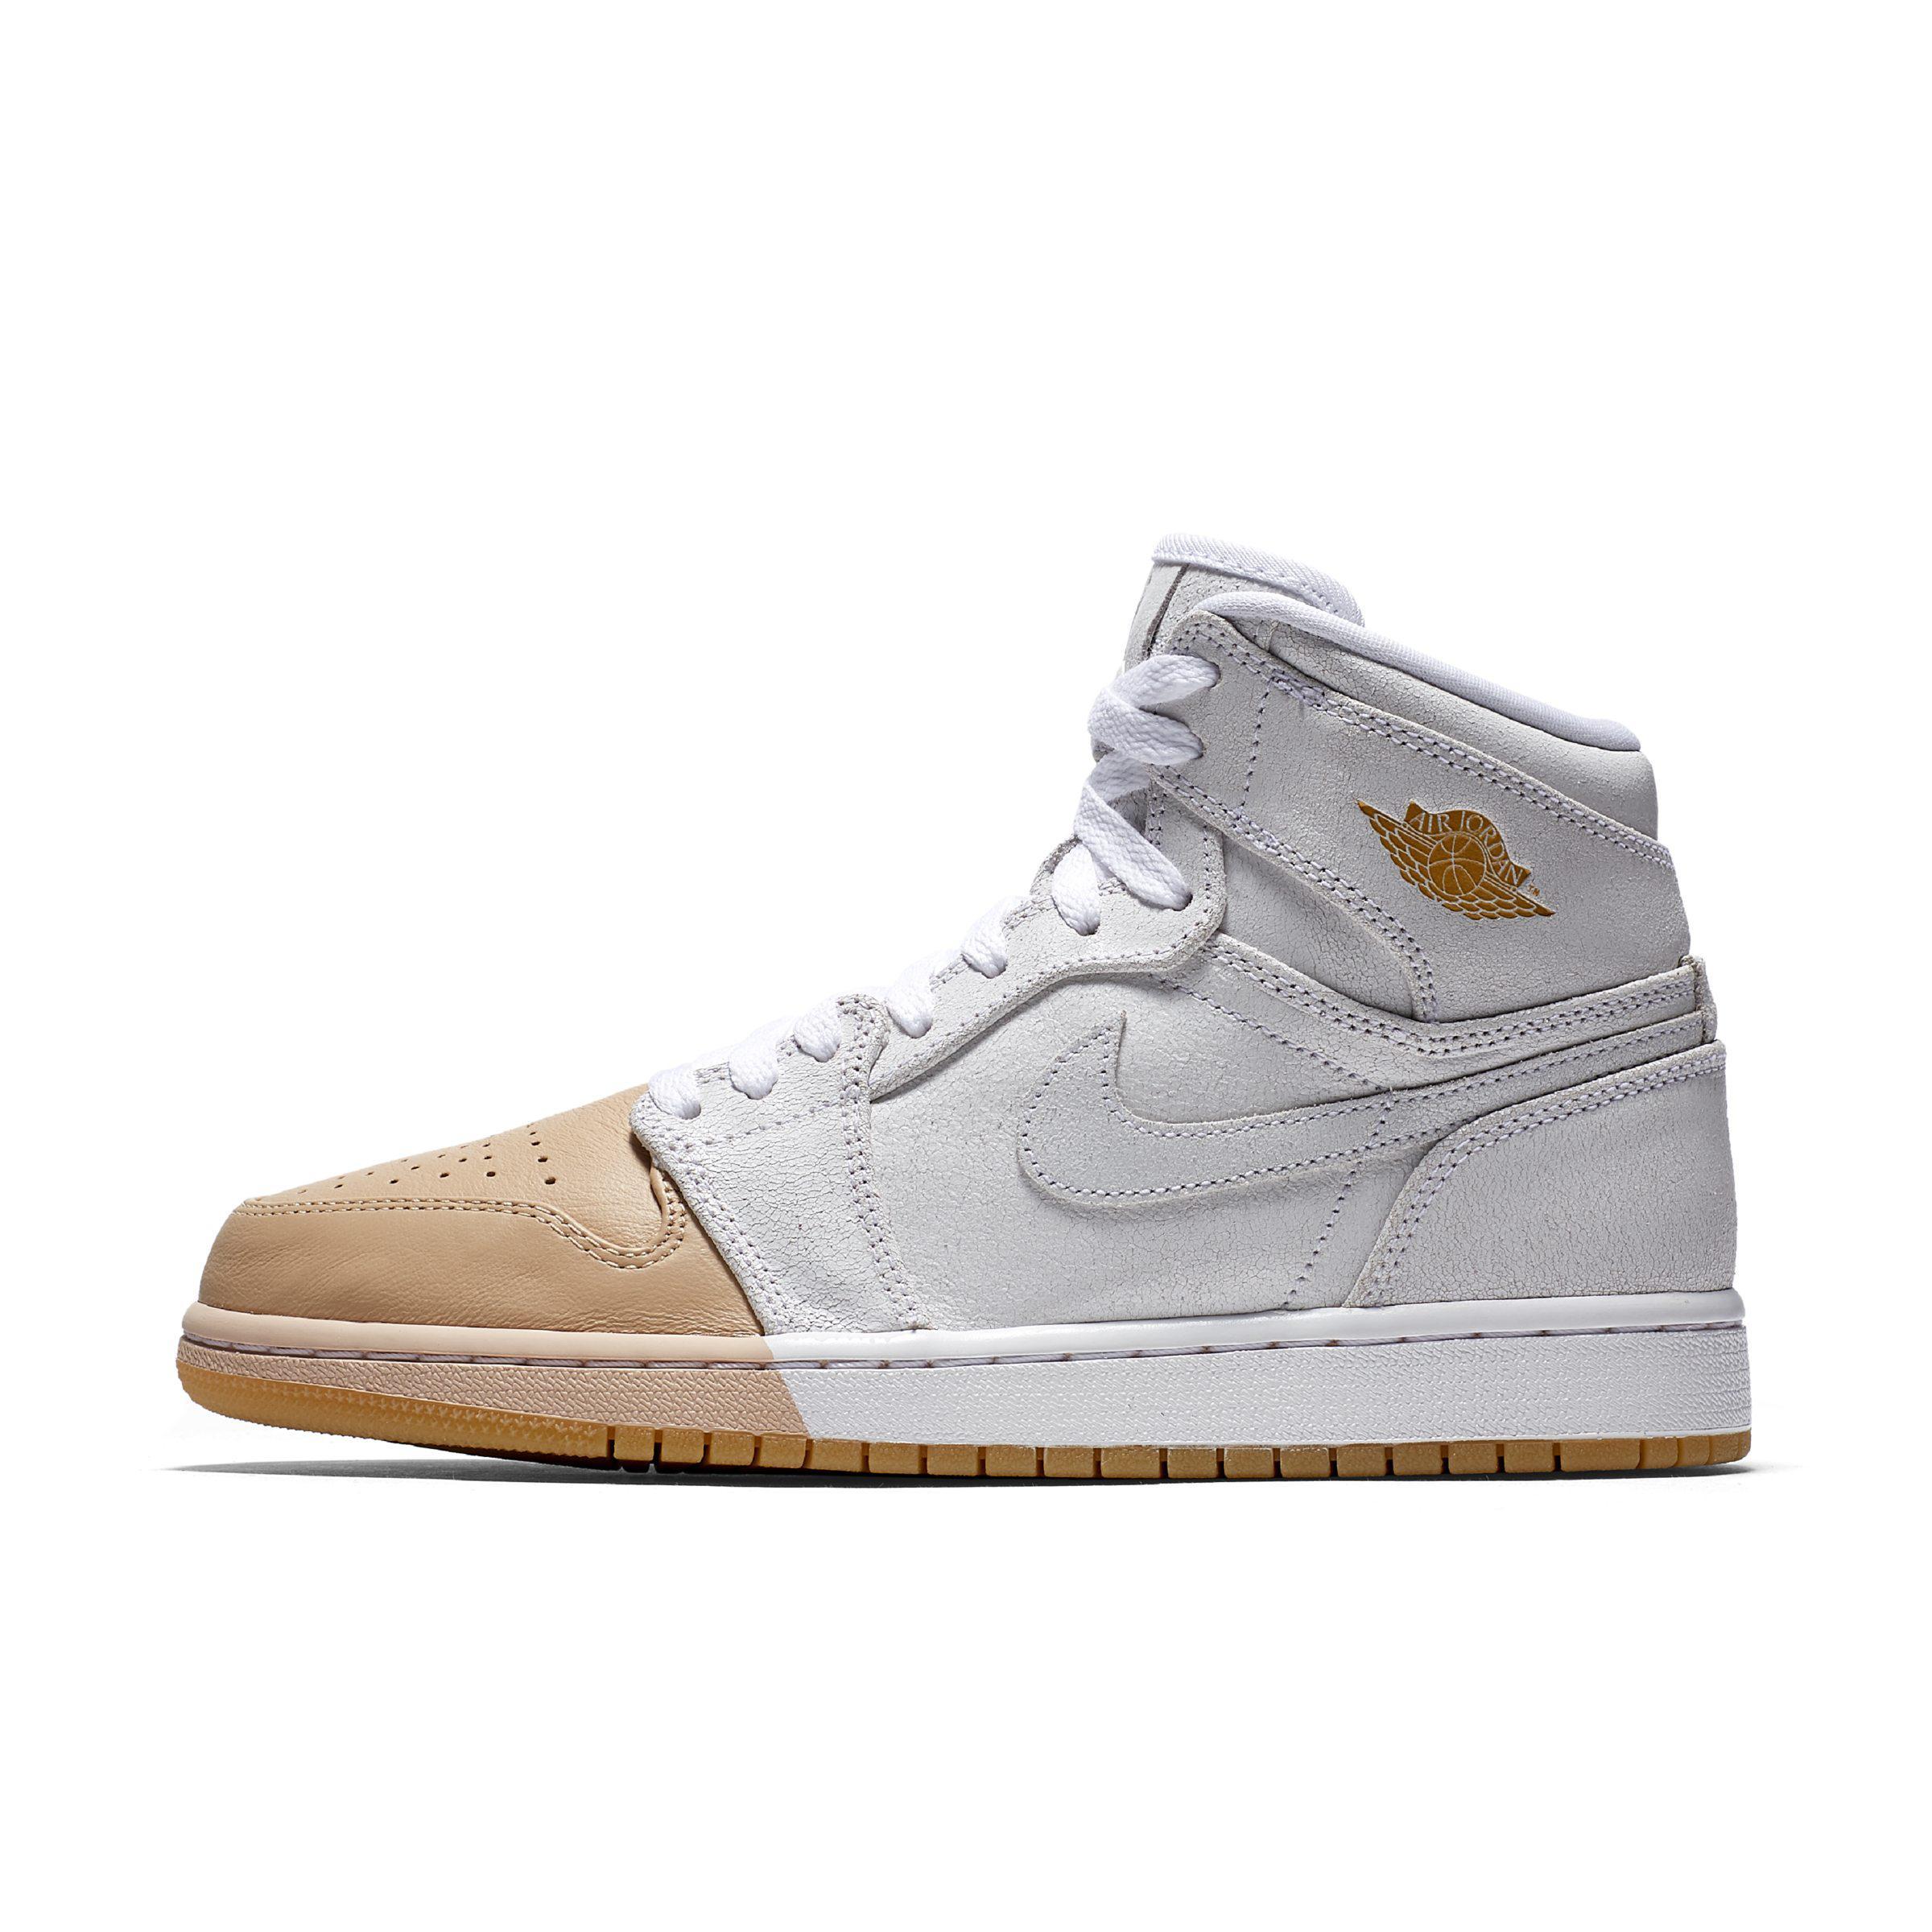 Nike Air Jordan 1 Retro High Premium Shoe in White - Lyst b9918c0aa6